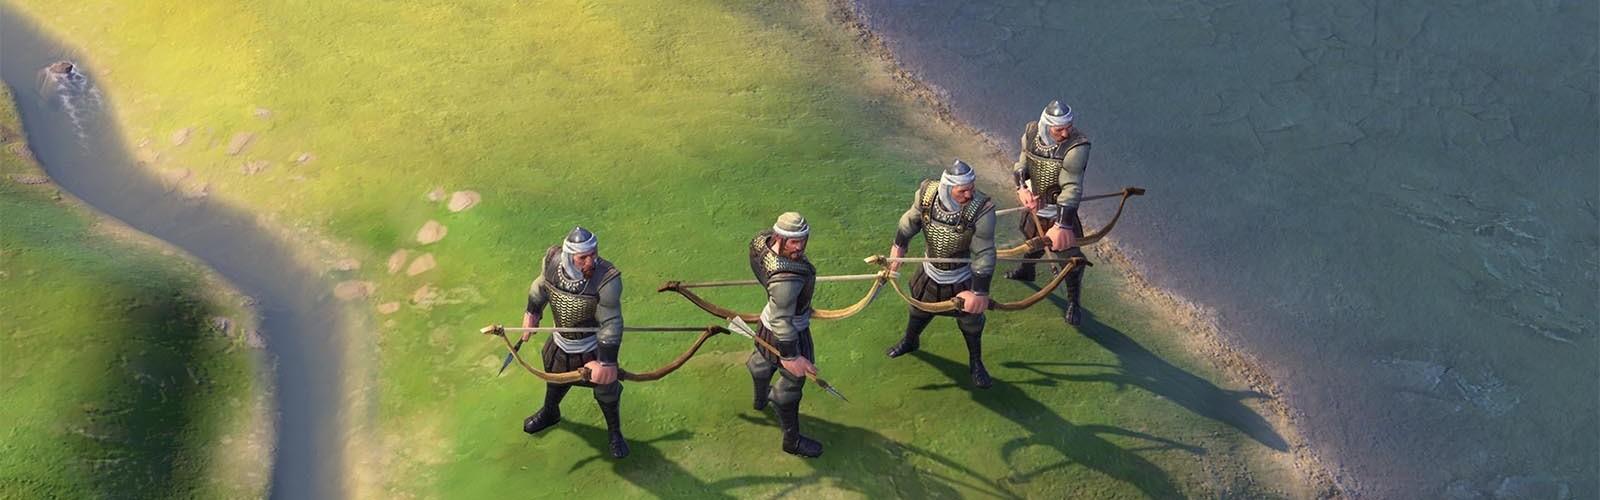 Sid Meier's Civilization VI - Persia and Macedon Civilization & Scenario Pack (DLC) Steam Key GLOBAL